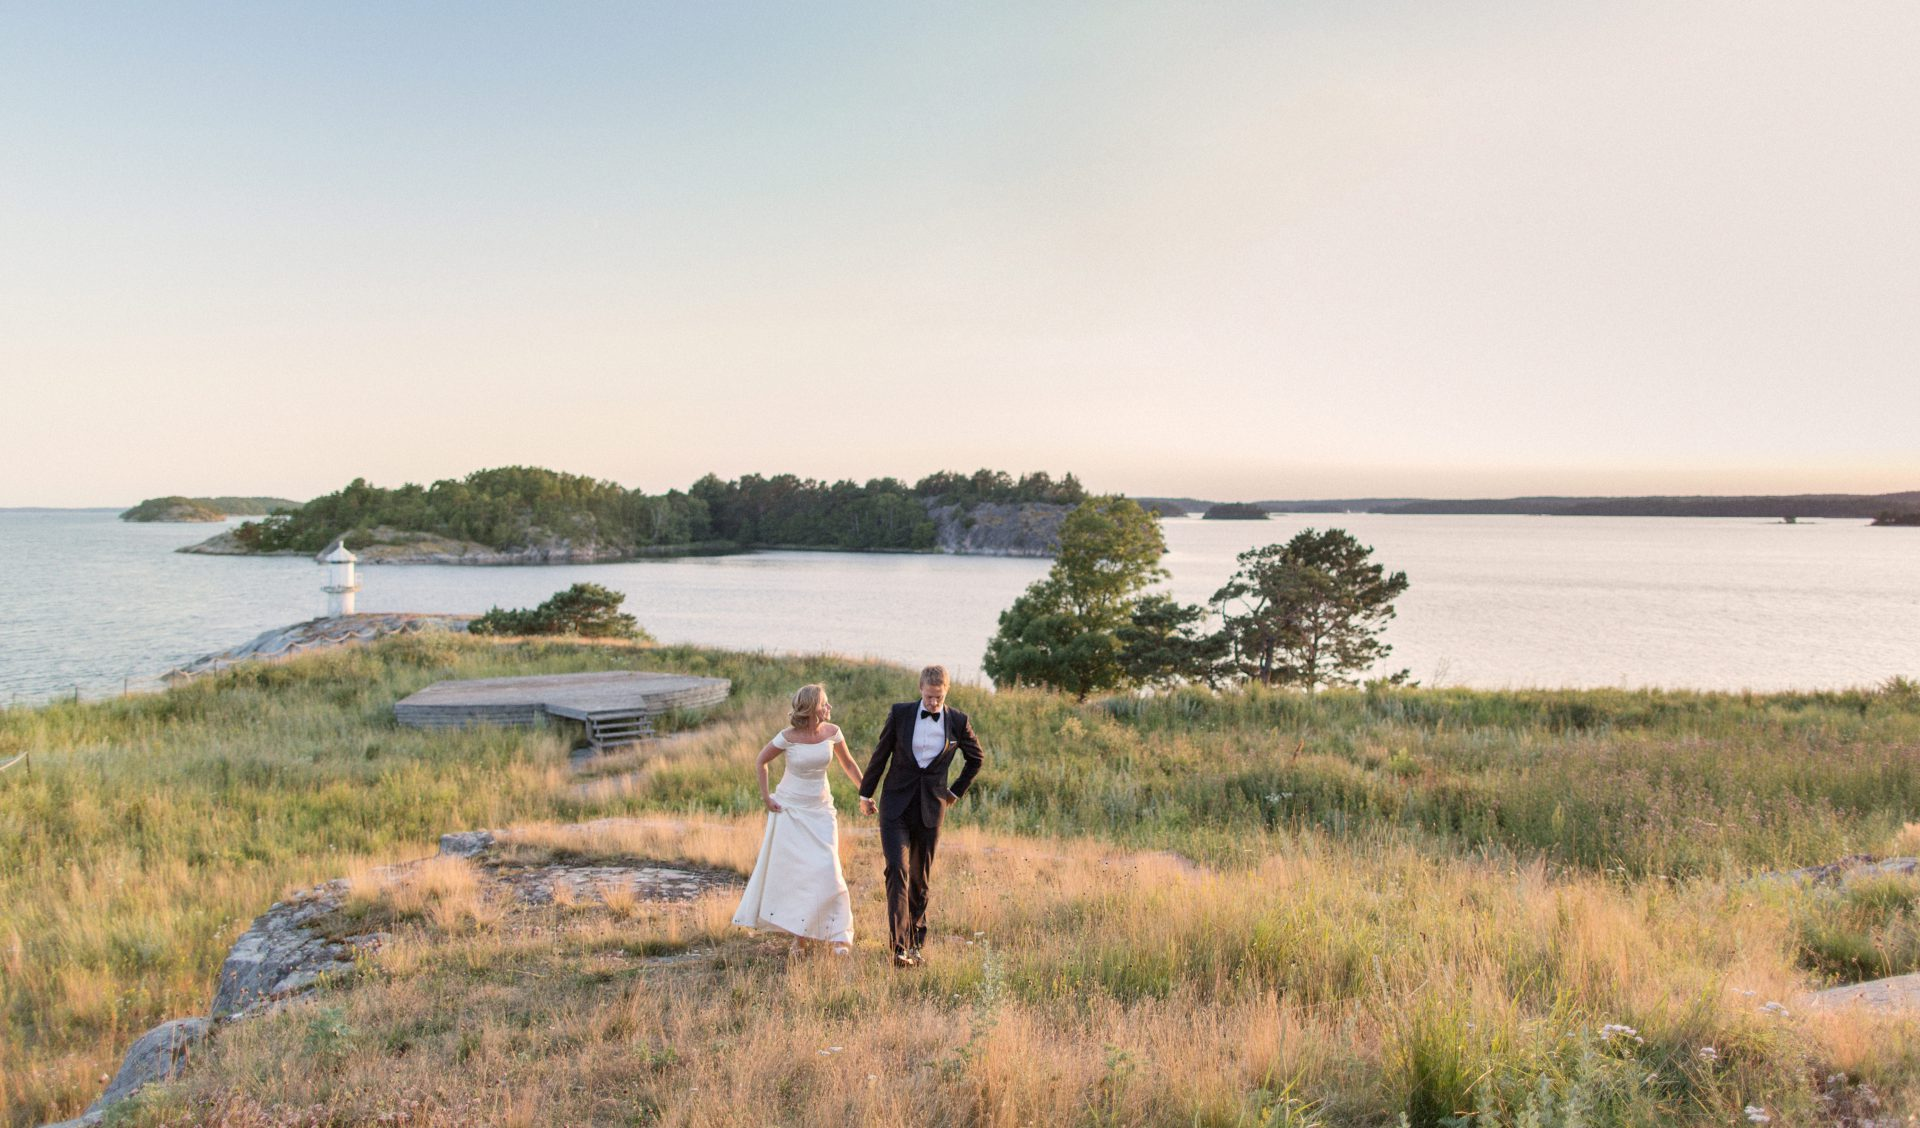 Wedding Photographer Lena Larsson, Sweden    © Lena Larsson